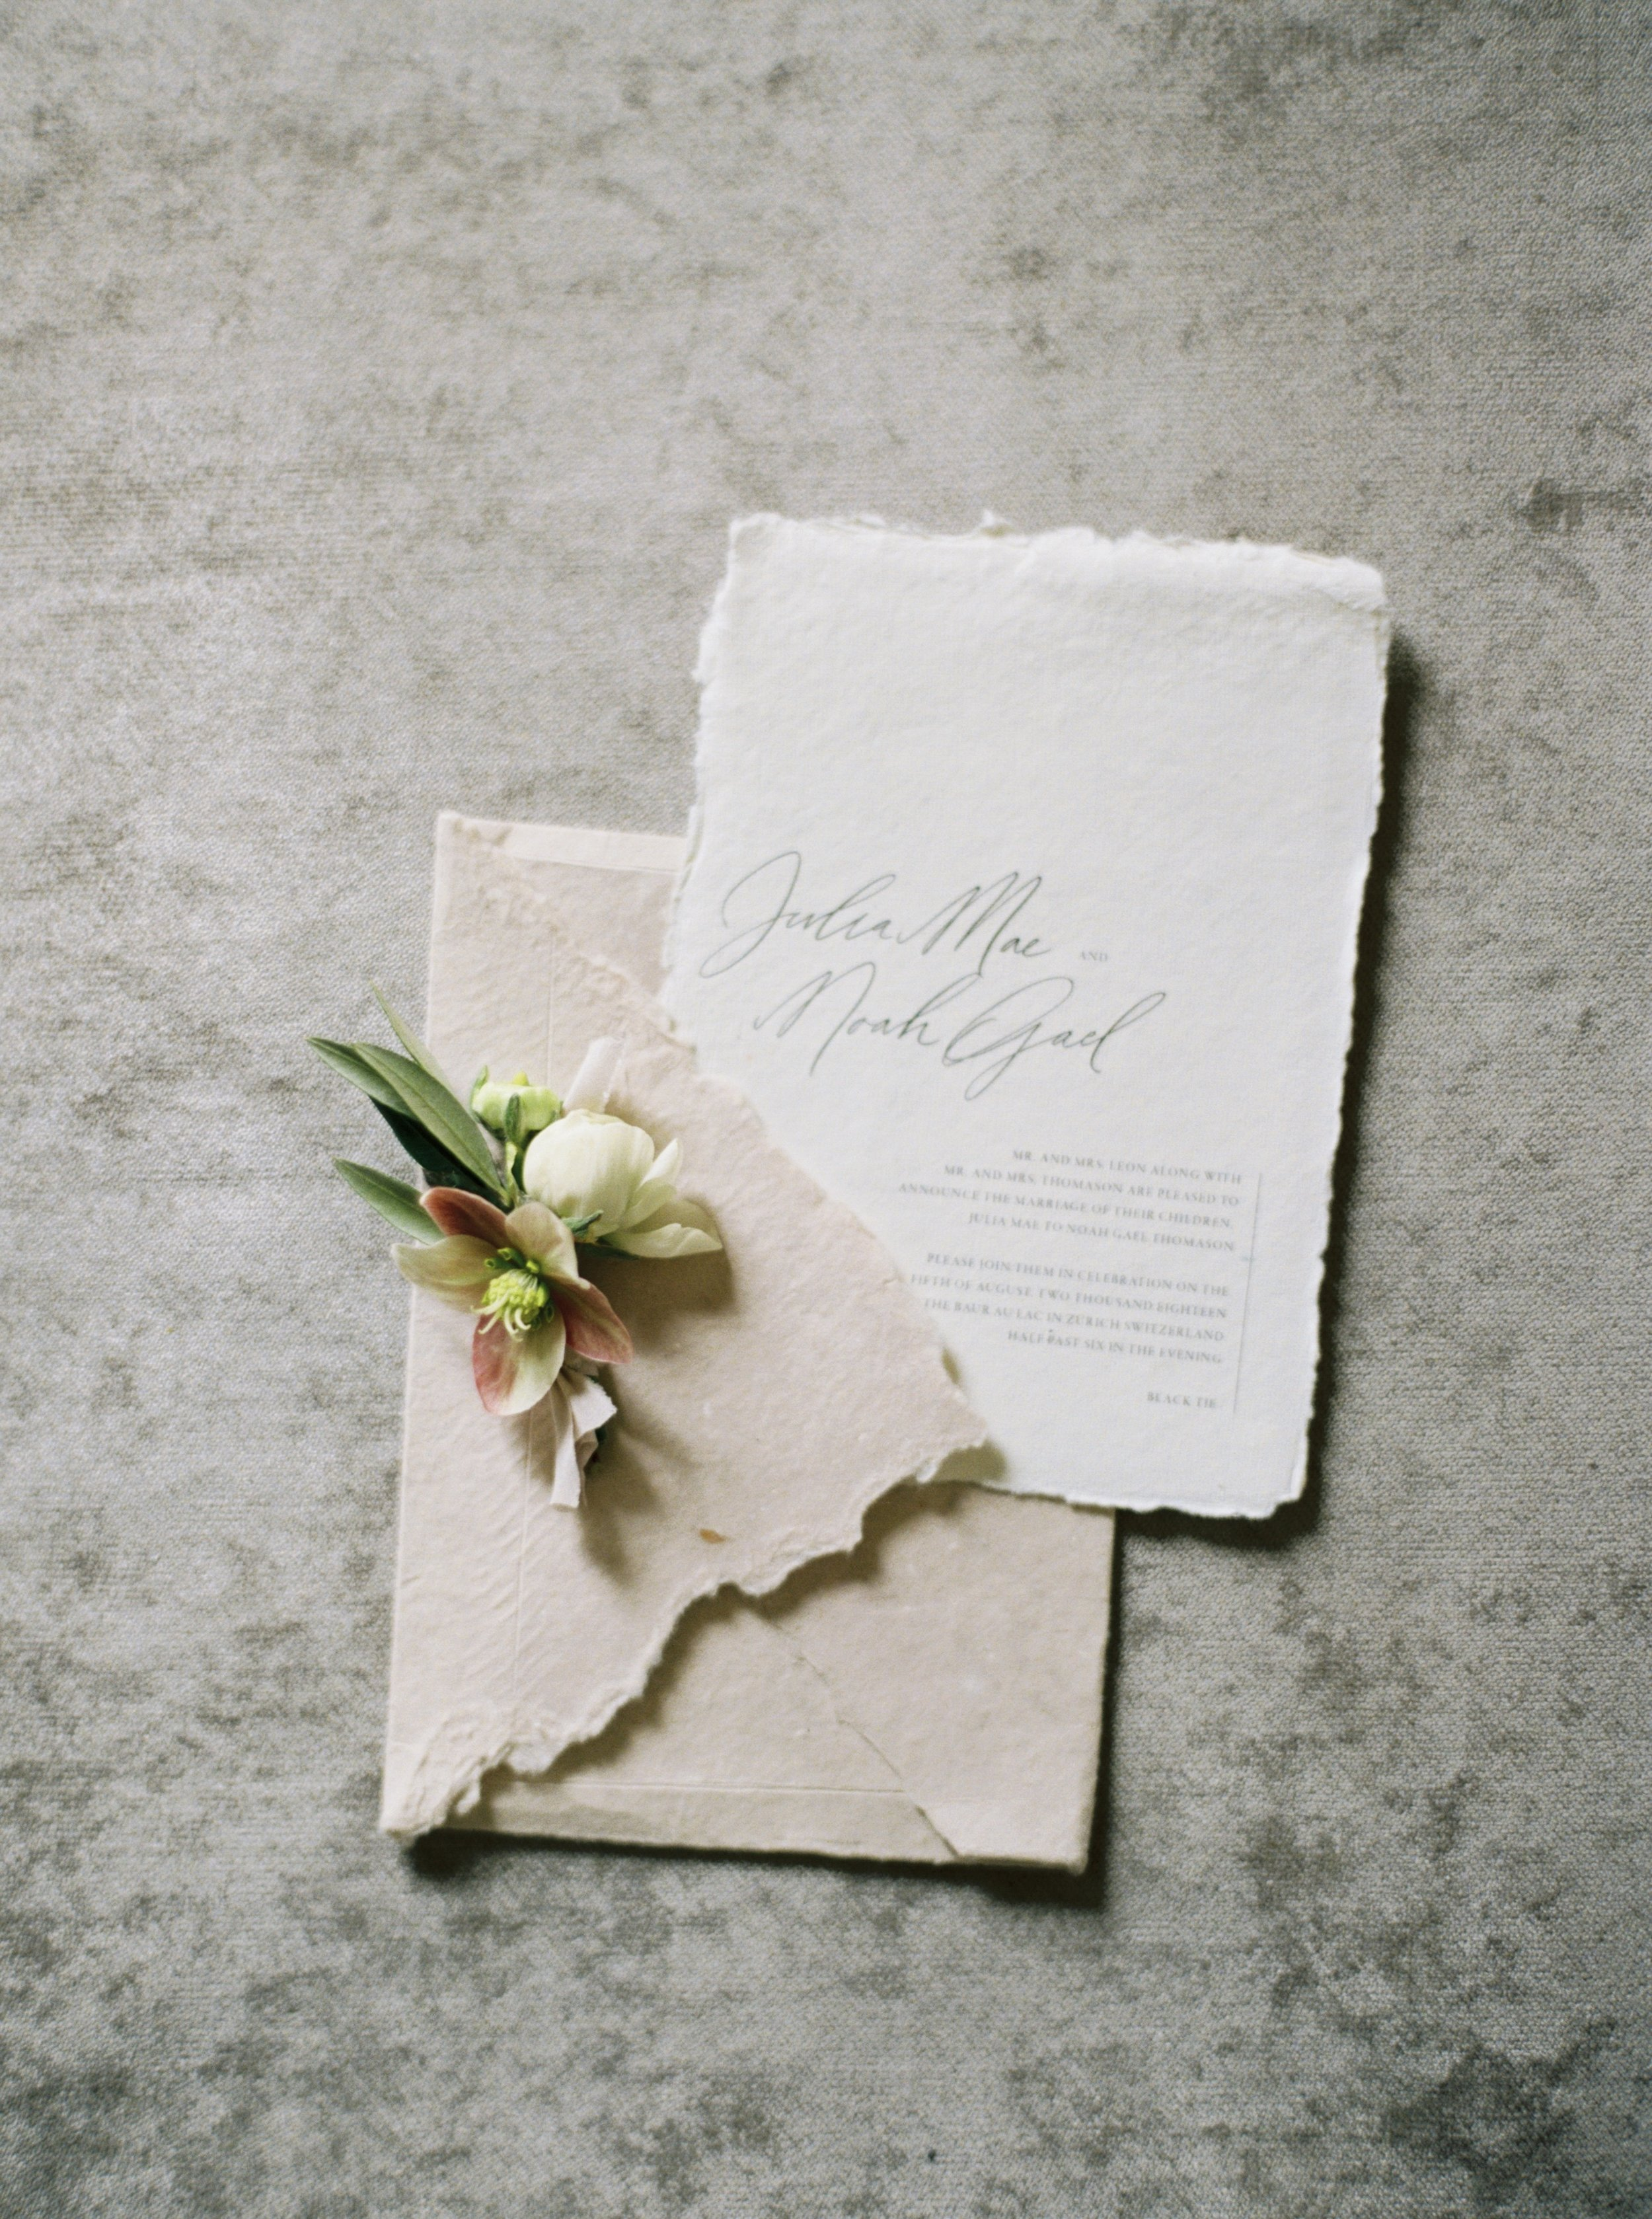 ink&pressco-mikylamanu-wedding-calligraphy-unearthing.tc.JPG